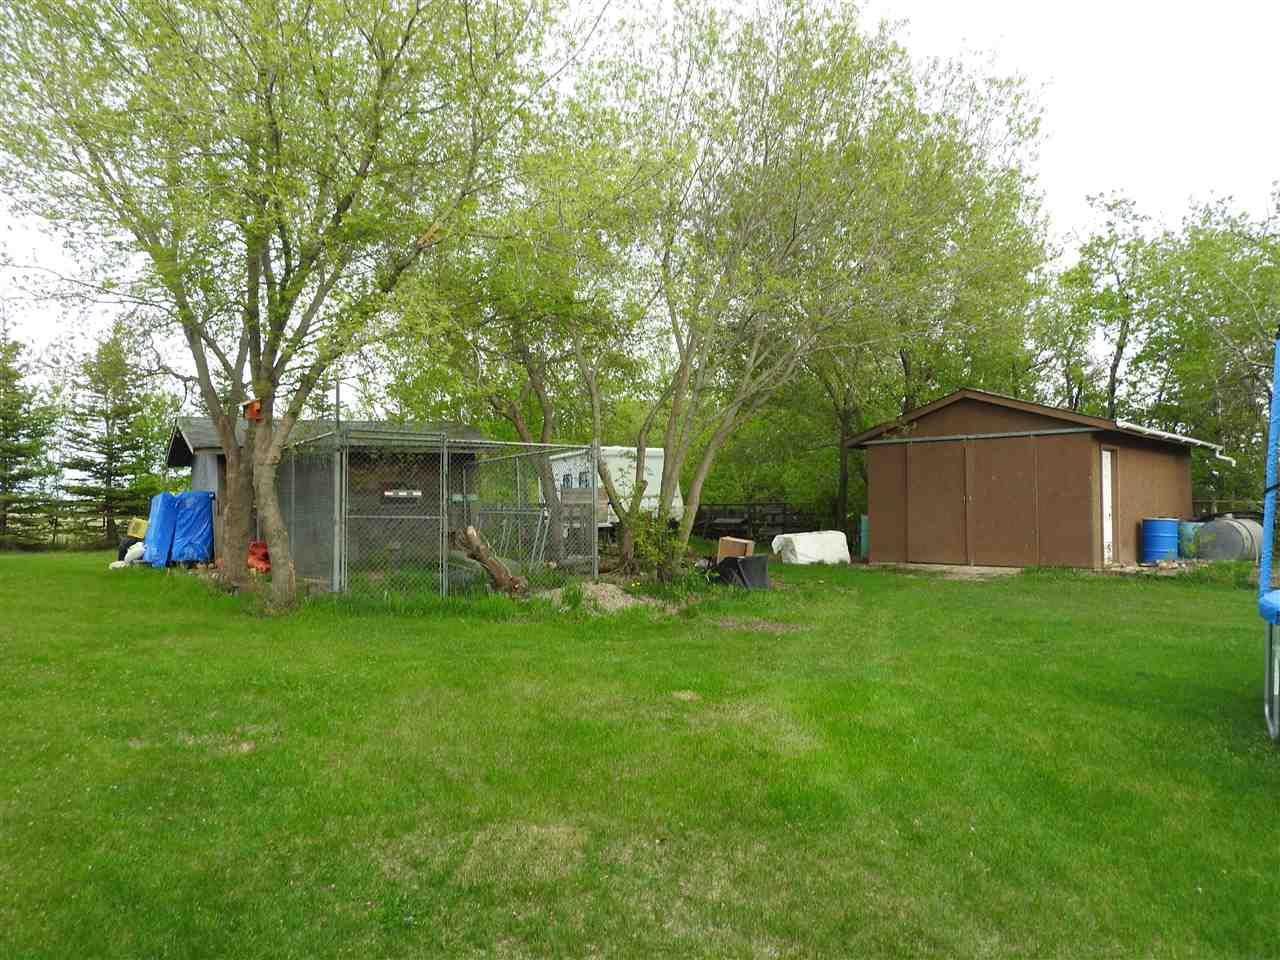 Photo 27: Photos: 55301 RGE RD 262: Rural Sturgeon County House for sale : MLS®# E4158158